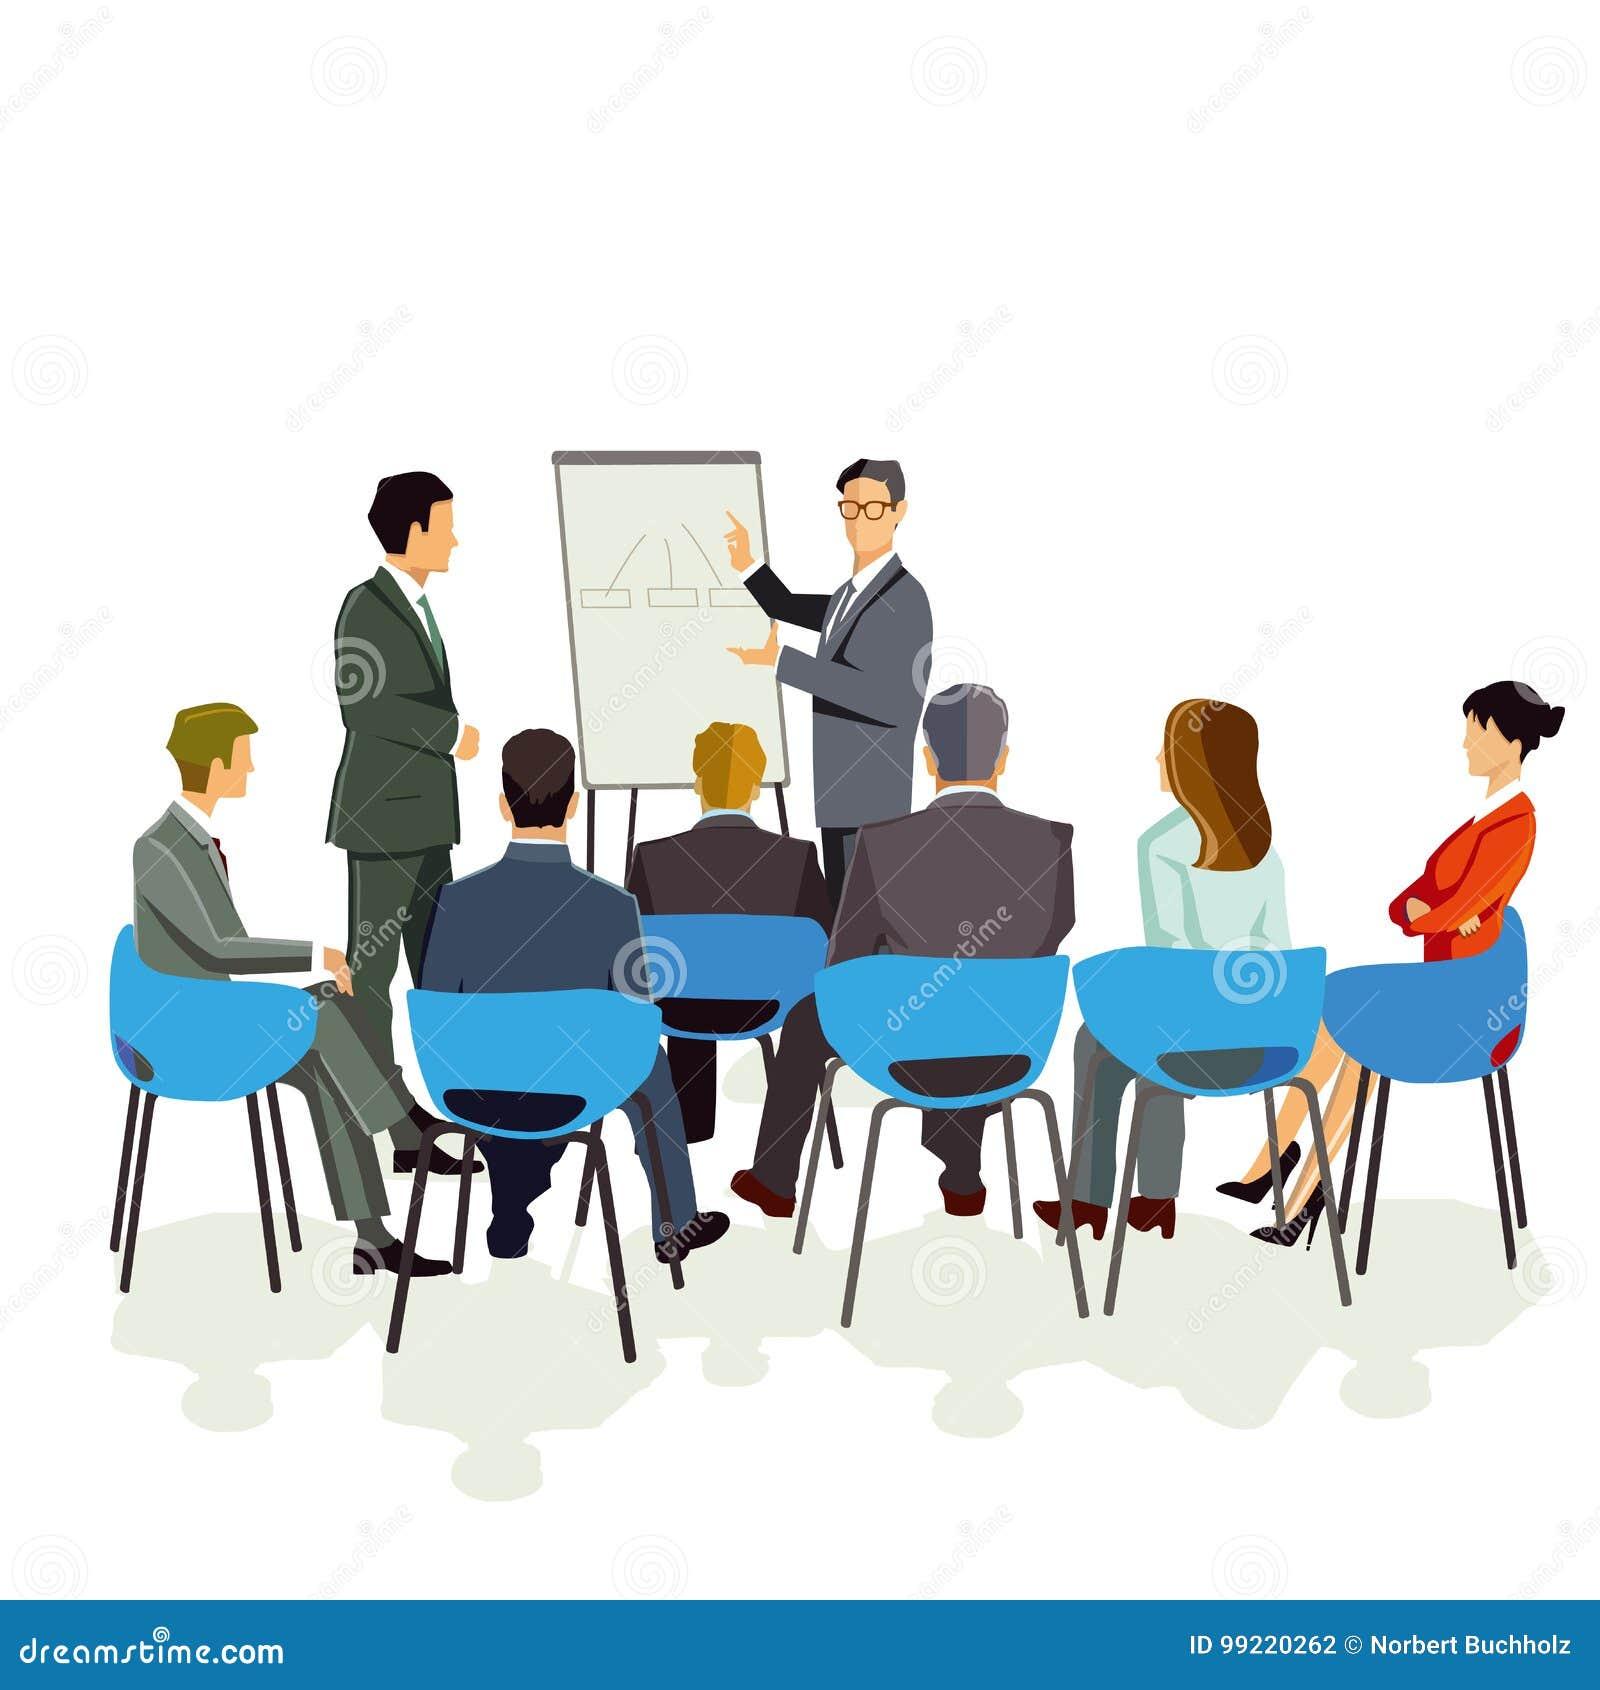 Presentation in meeting